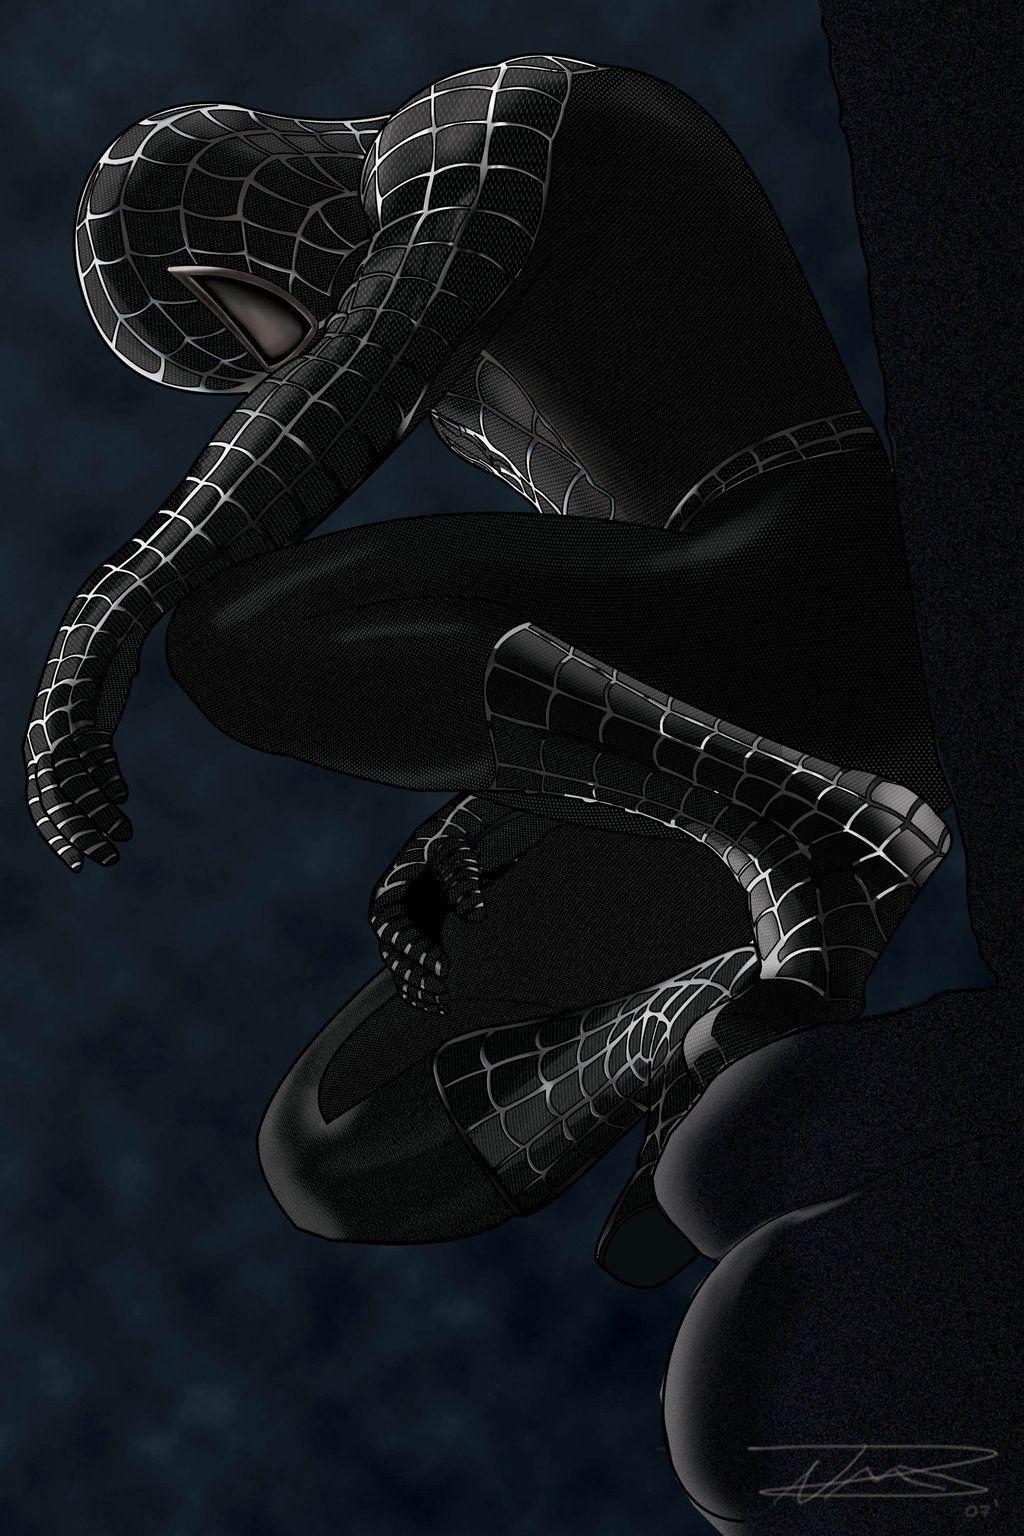 Black Spiderman 3 Wallpapers Wallpaper Cave